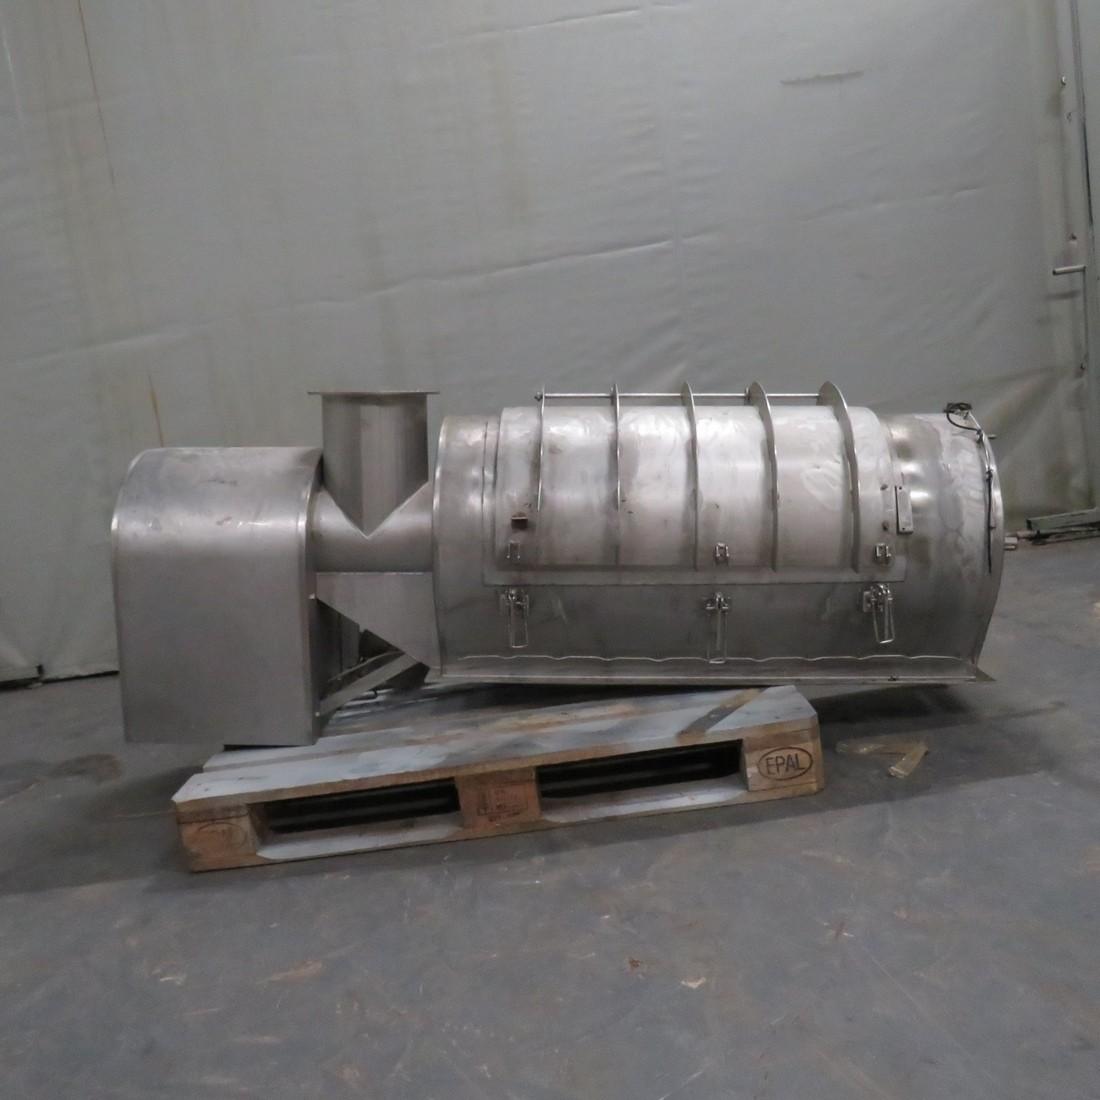 R15A1076 Sieving / dosing unit